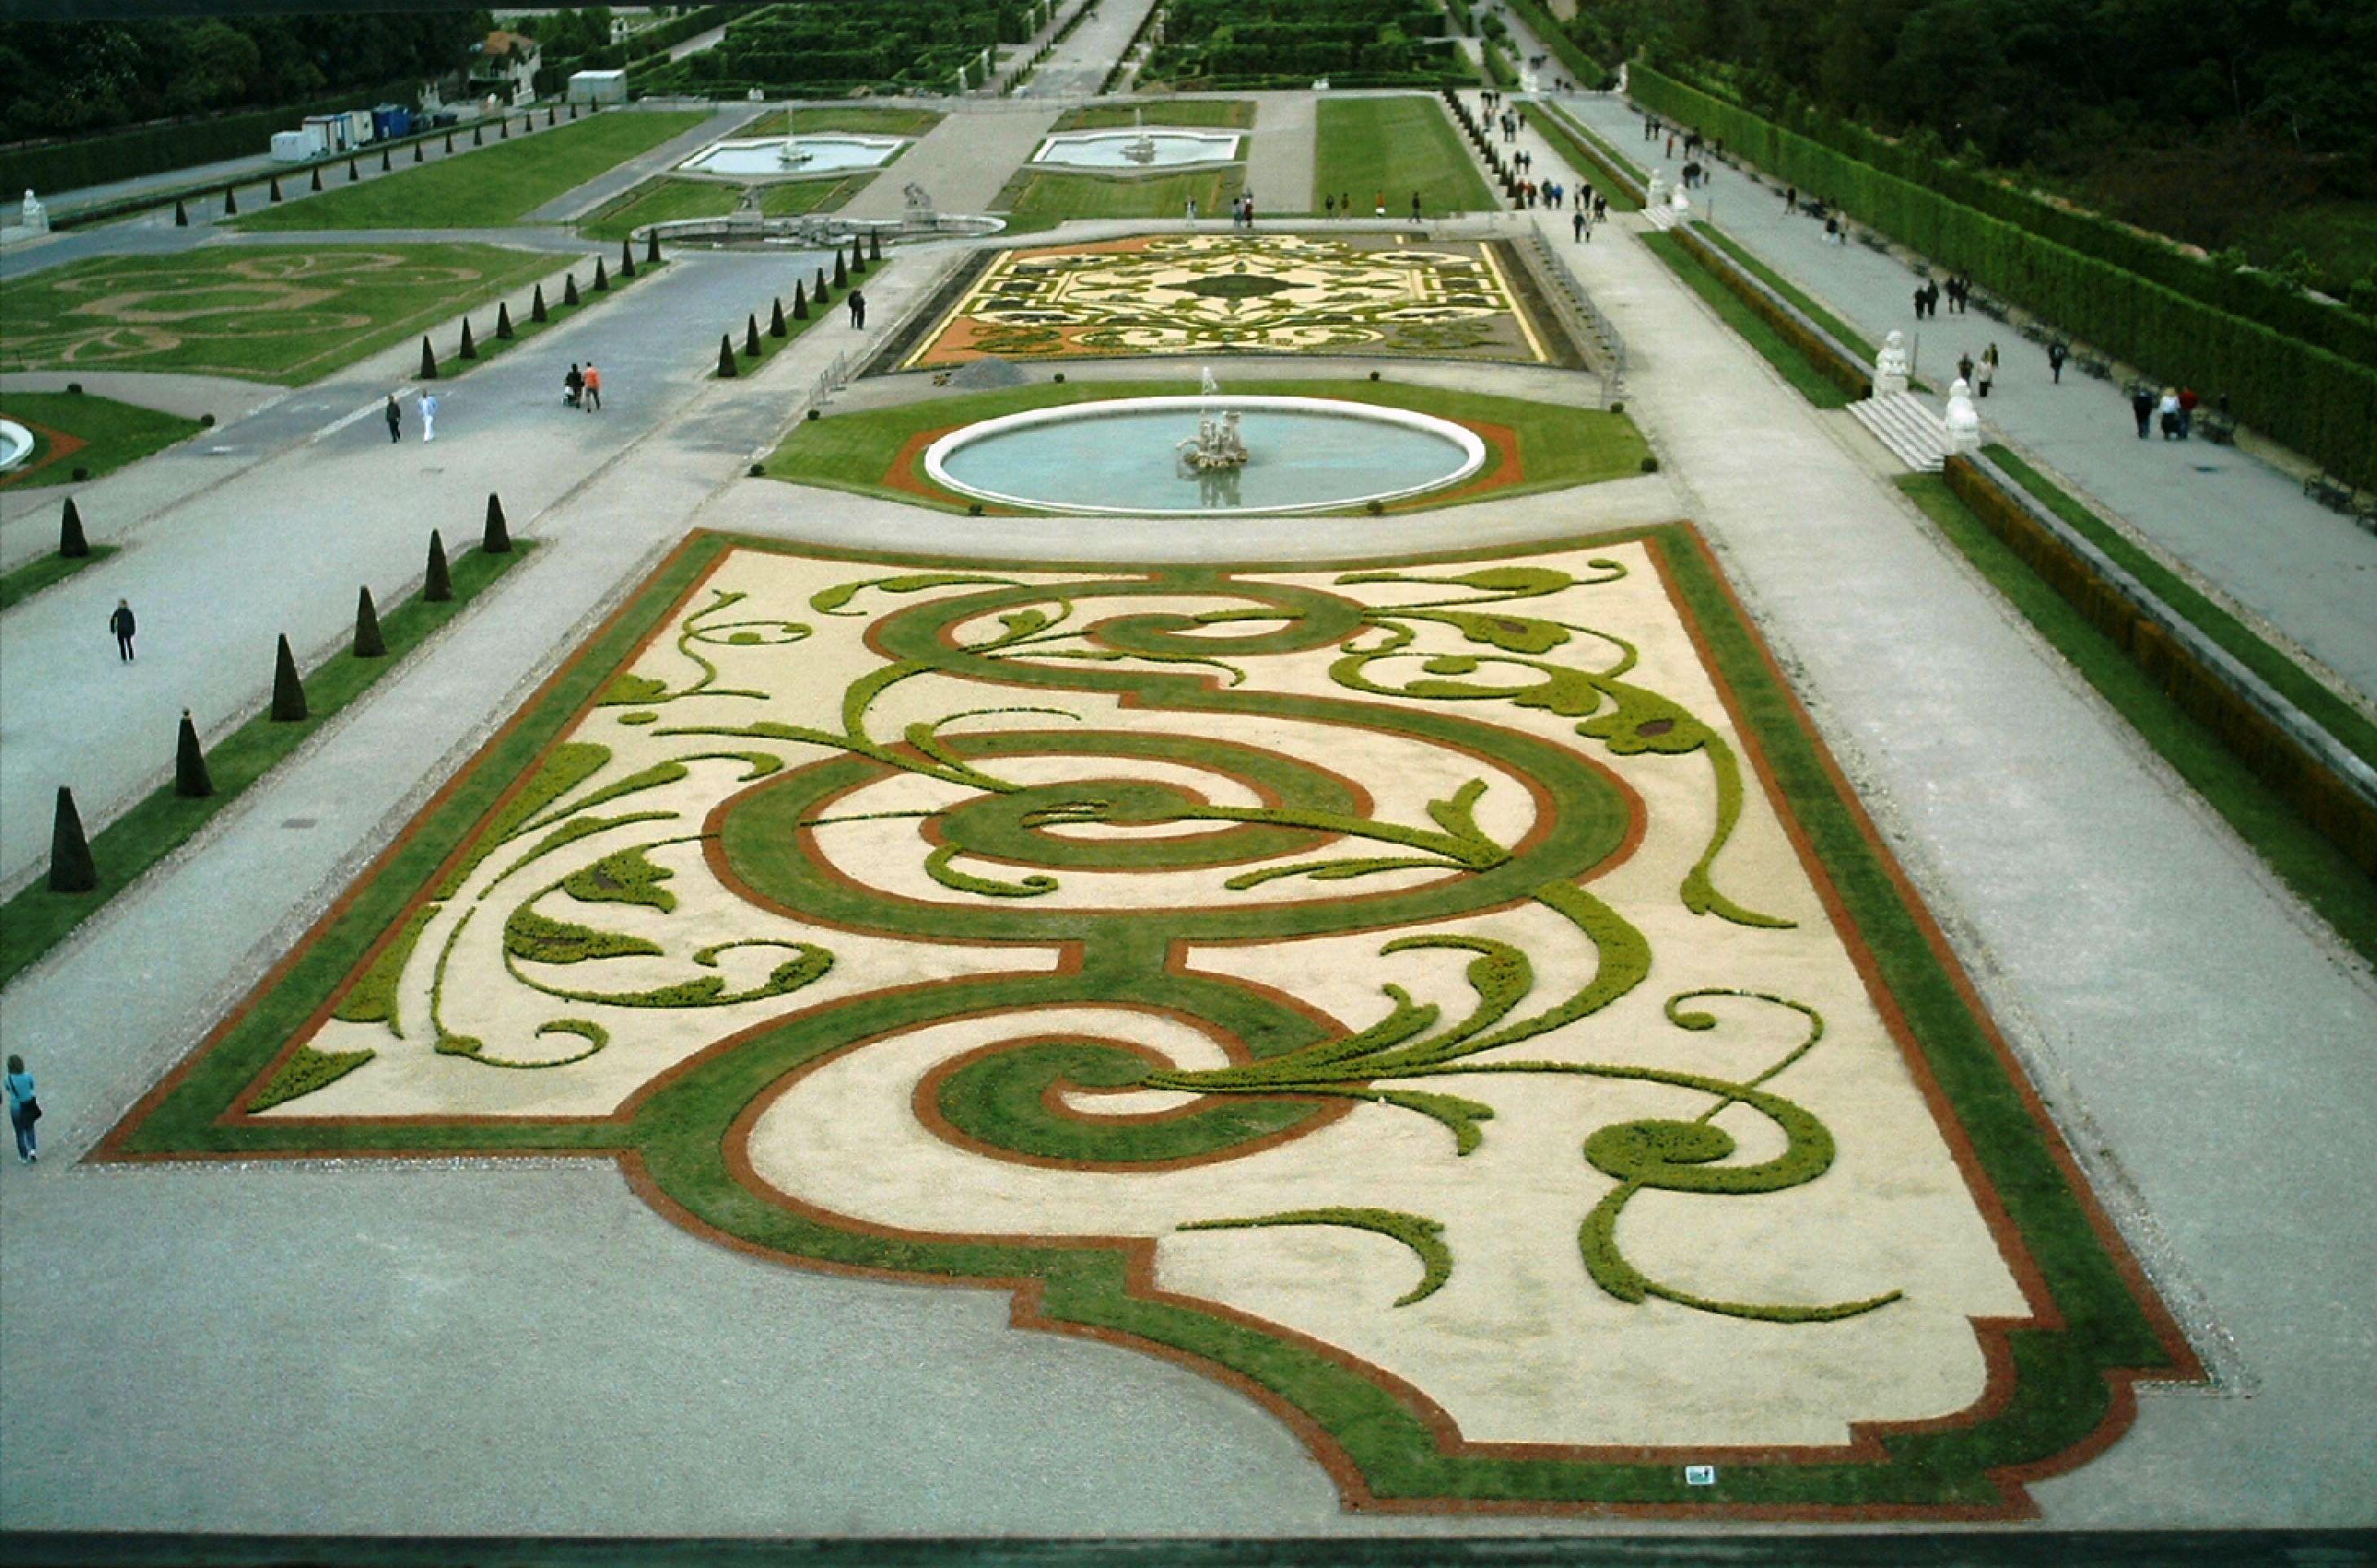 FileBelvedere Palaces GardensJPG Wikimedia Commons